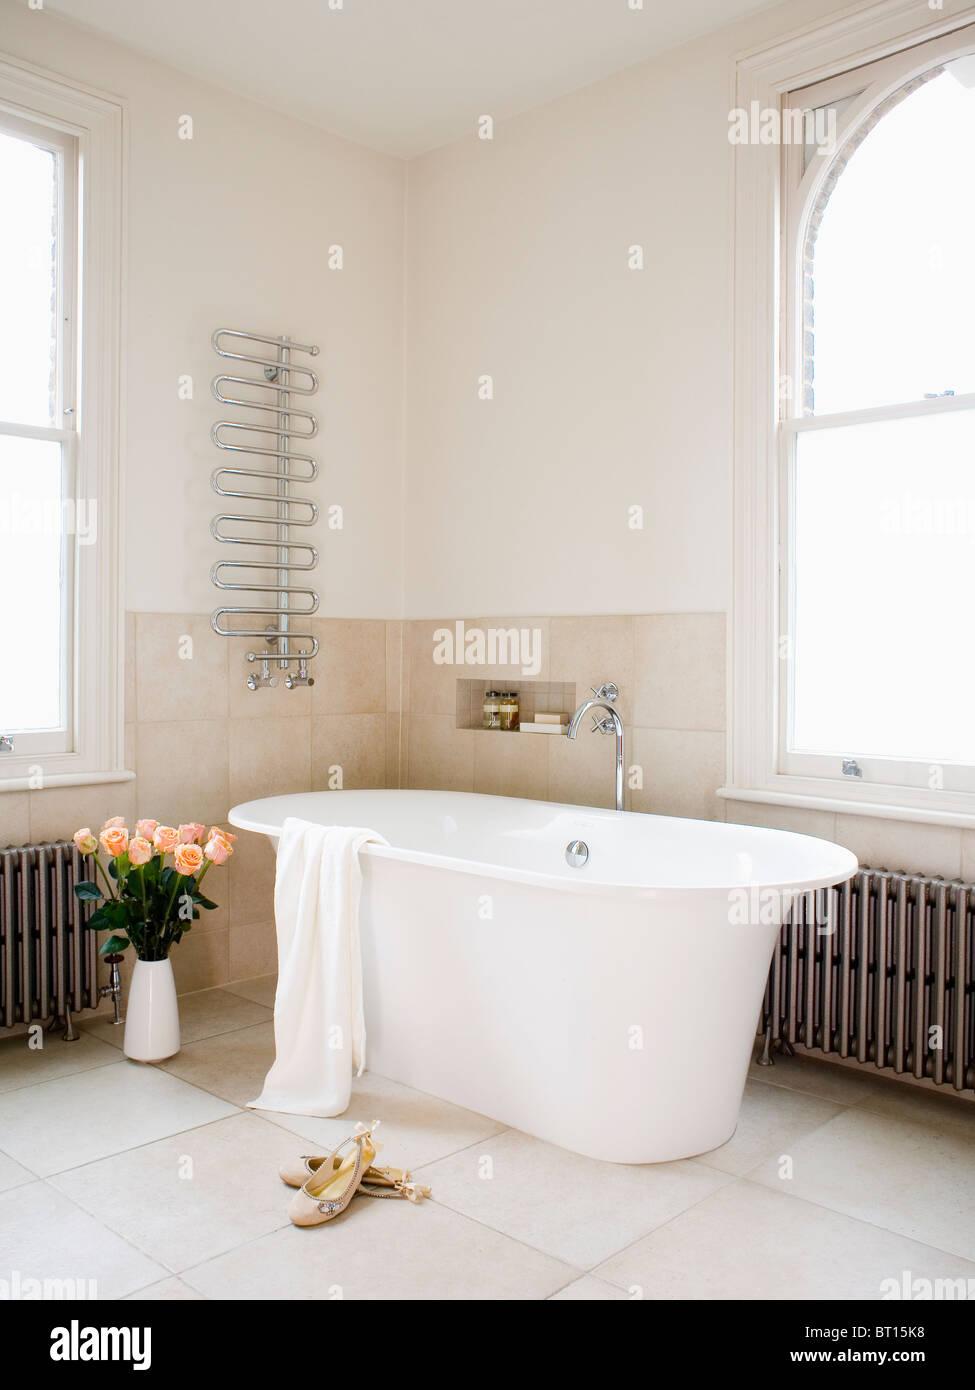 Large Modern Freestanding Bath In Modern White Bathroom With Stock - Bathroom with freestanding bath